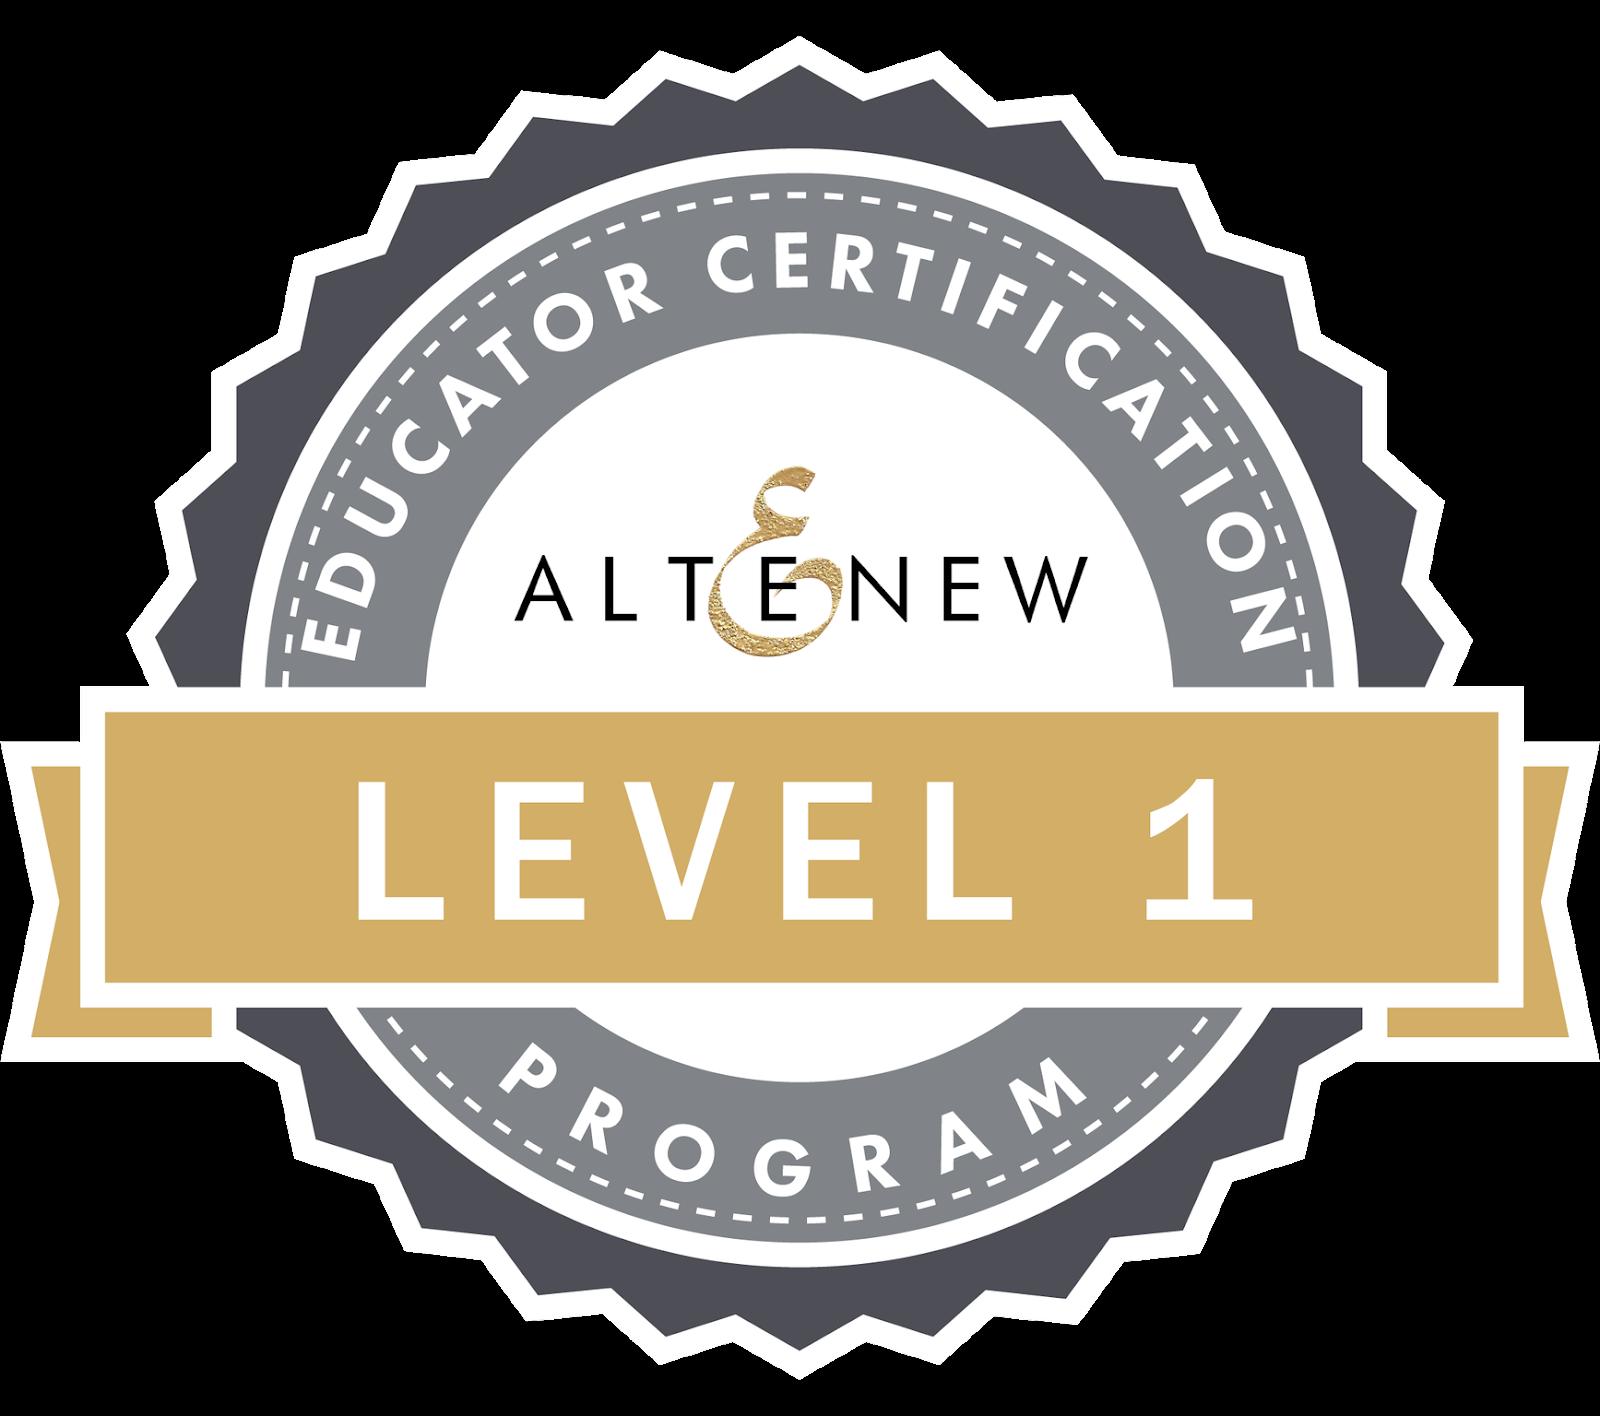 Altenew Educator Level 1